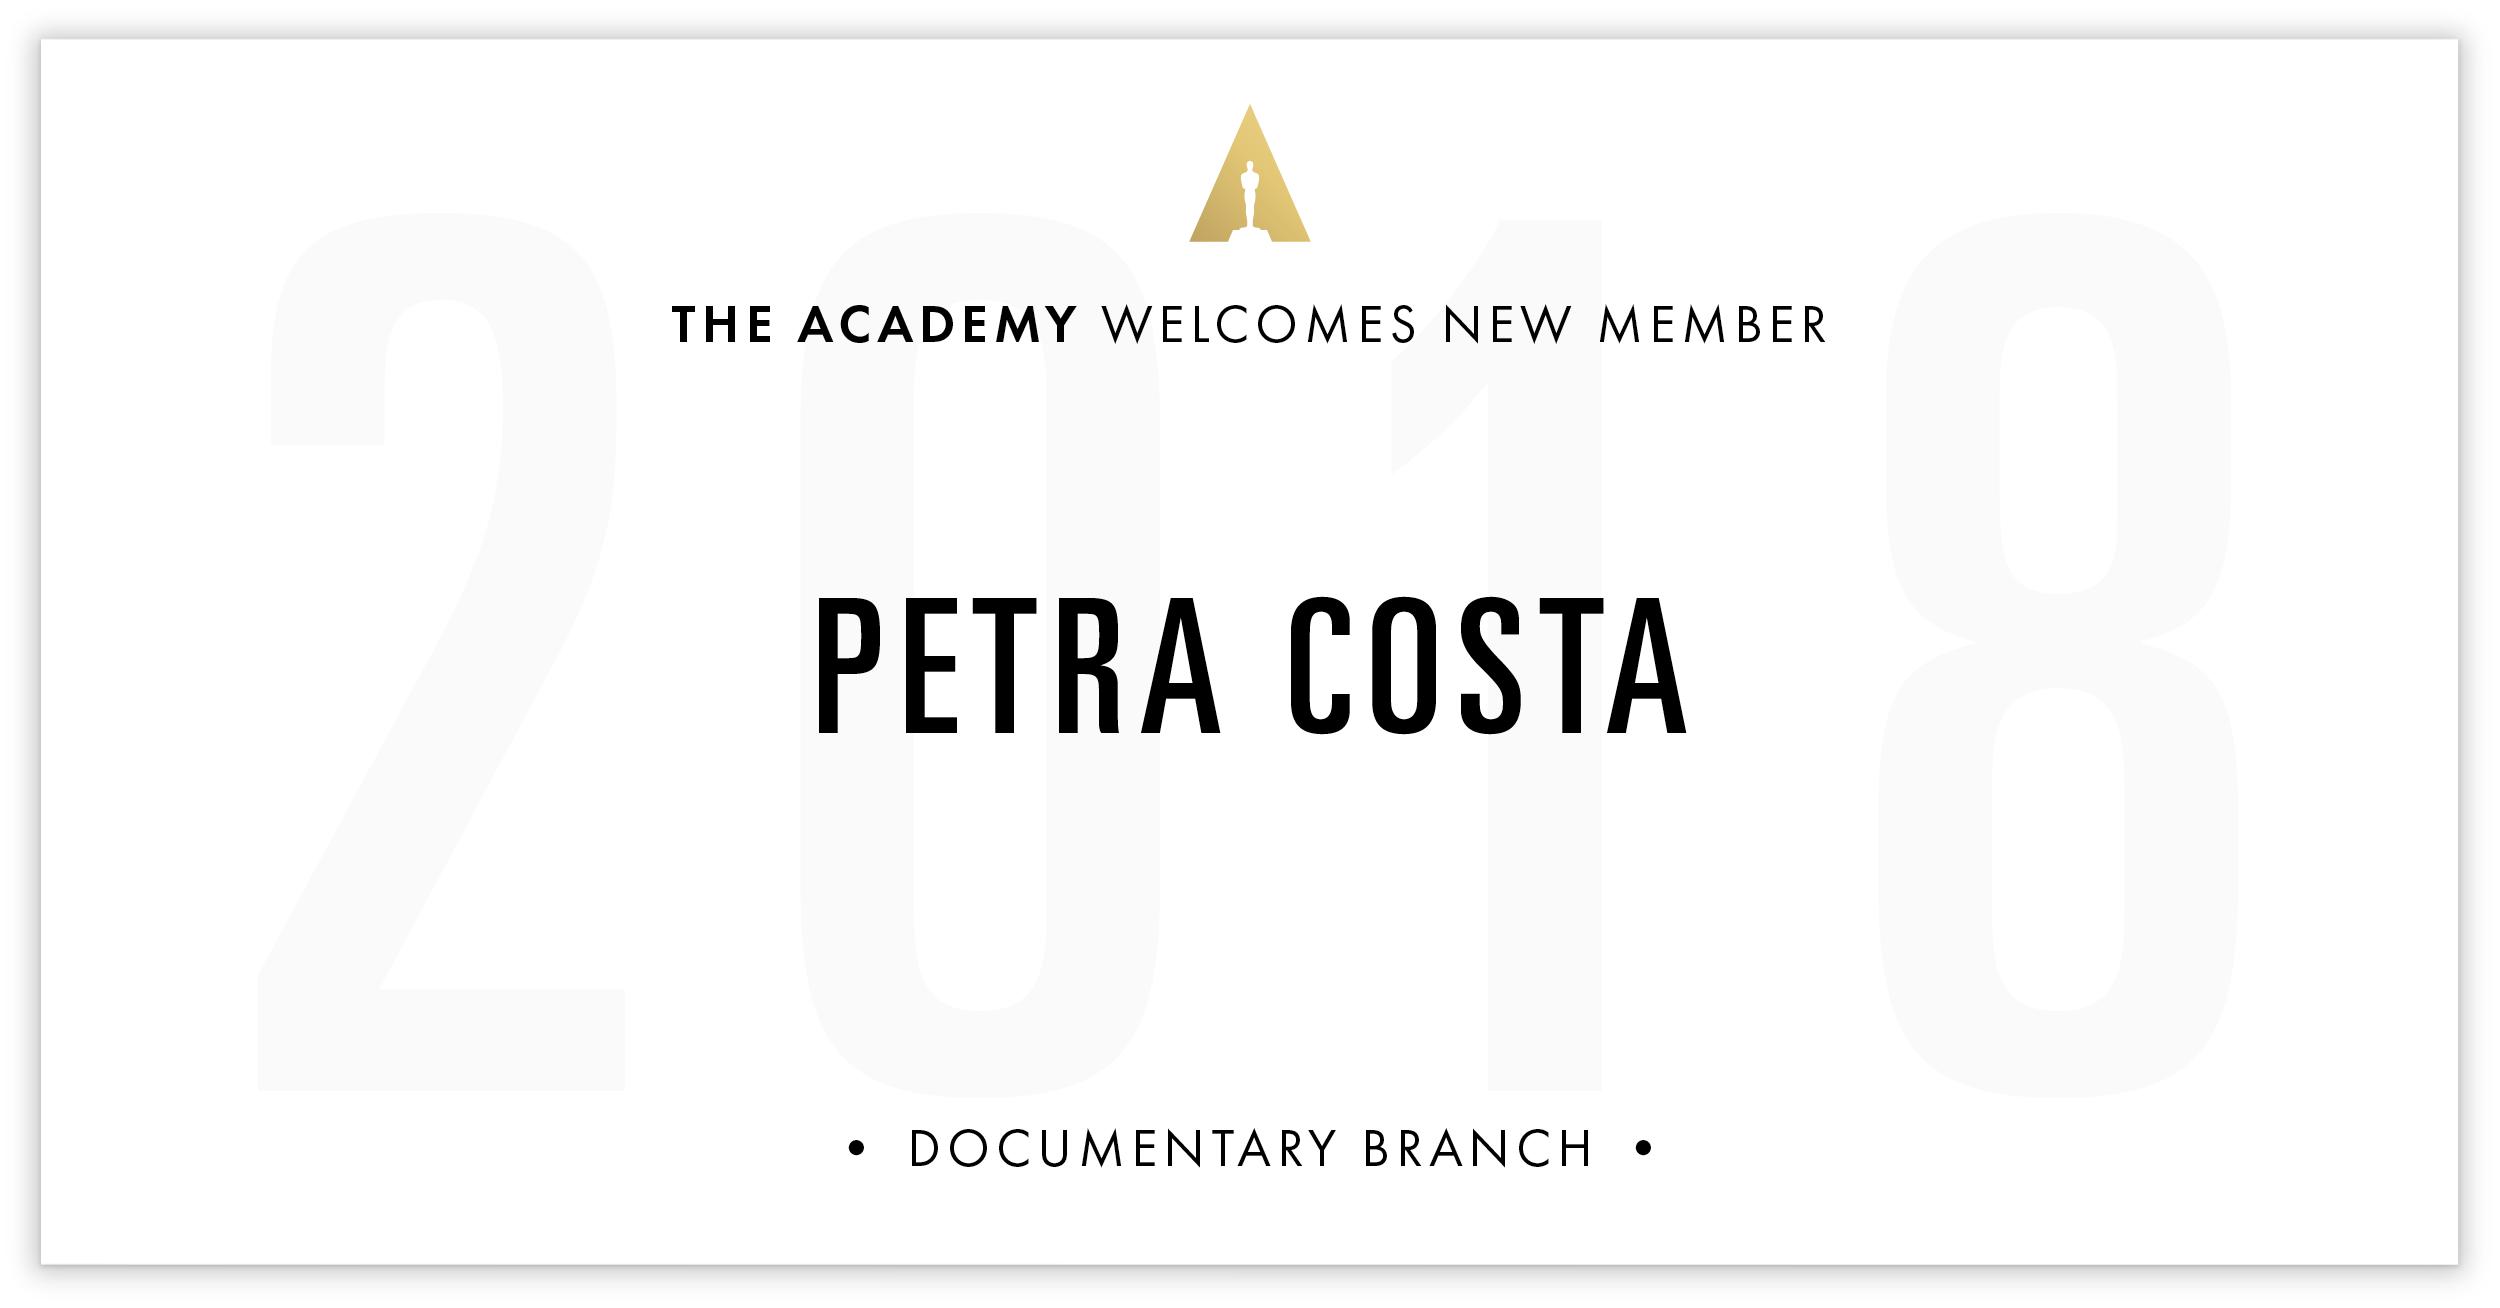 Petra Costa is invited!